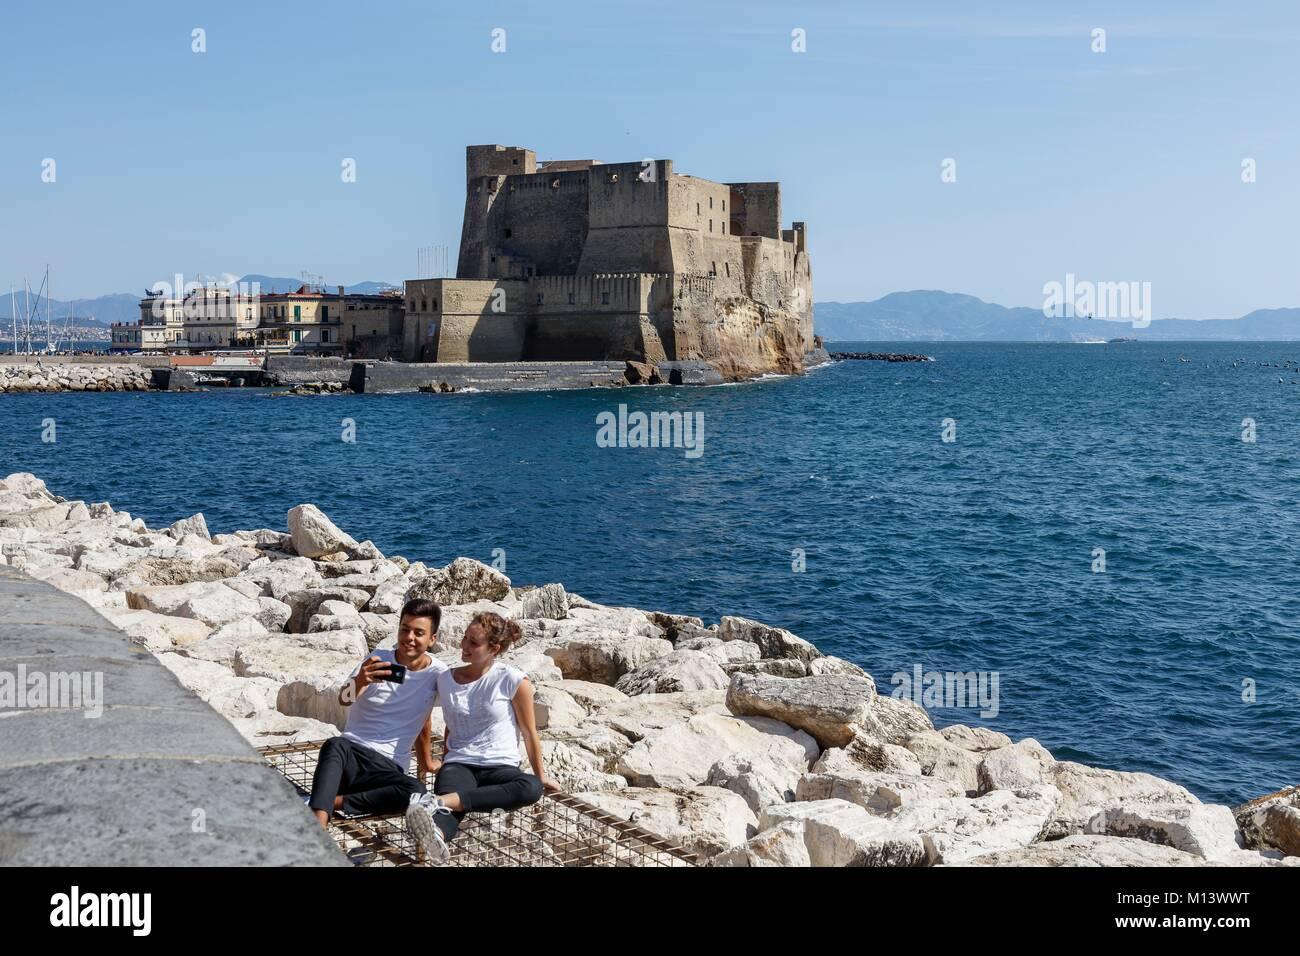 Italia, Campania, Nápoles, centro histórico catalogado como Patrimonio Mundial por la UNESCO, la joven Imagen De Stock